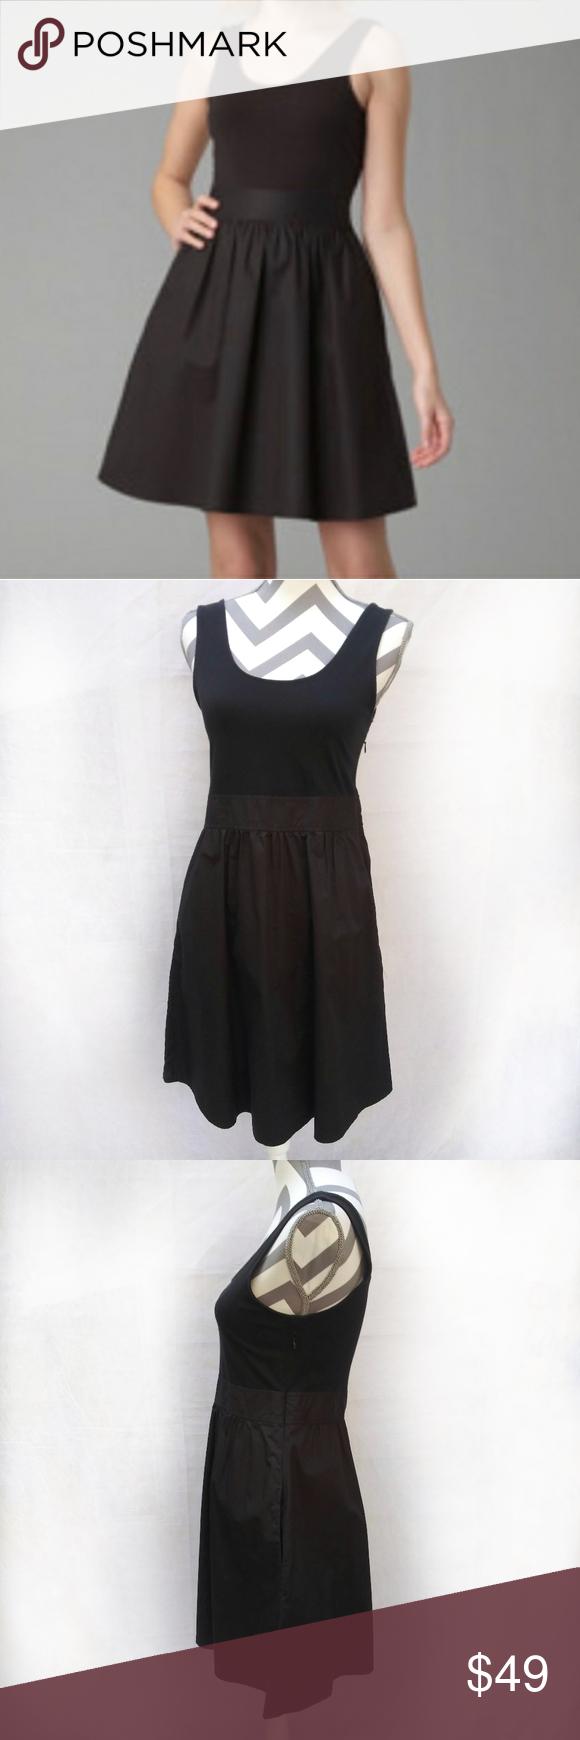 Theory Boa Little Black Dress With Pockets 8 Mixed Media Black Dress With Pockets By Theory Top Is Black Dress With Pockets Little Black Dress Lbd Black Dress [ 1740 x 580 Pixel ]